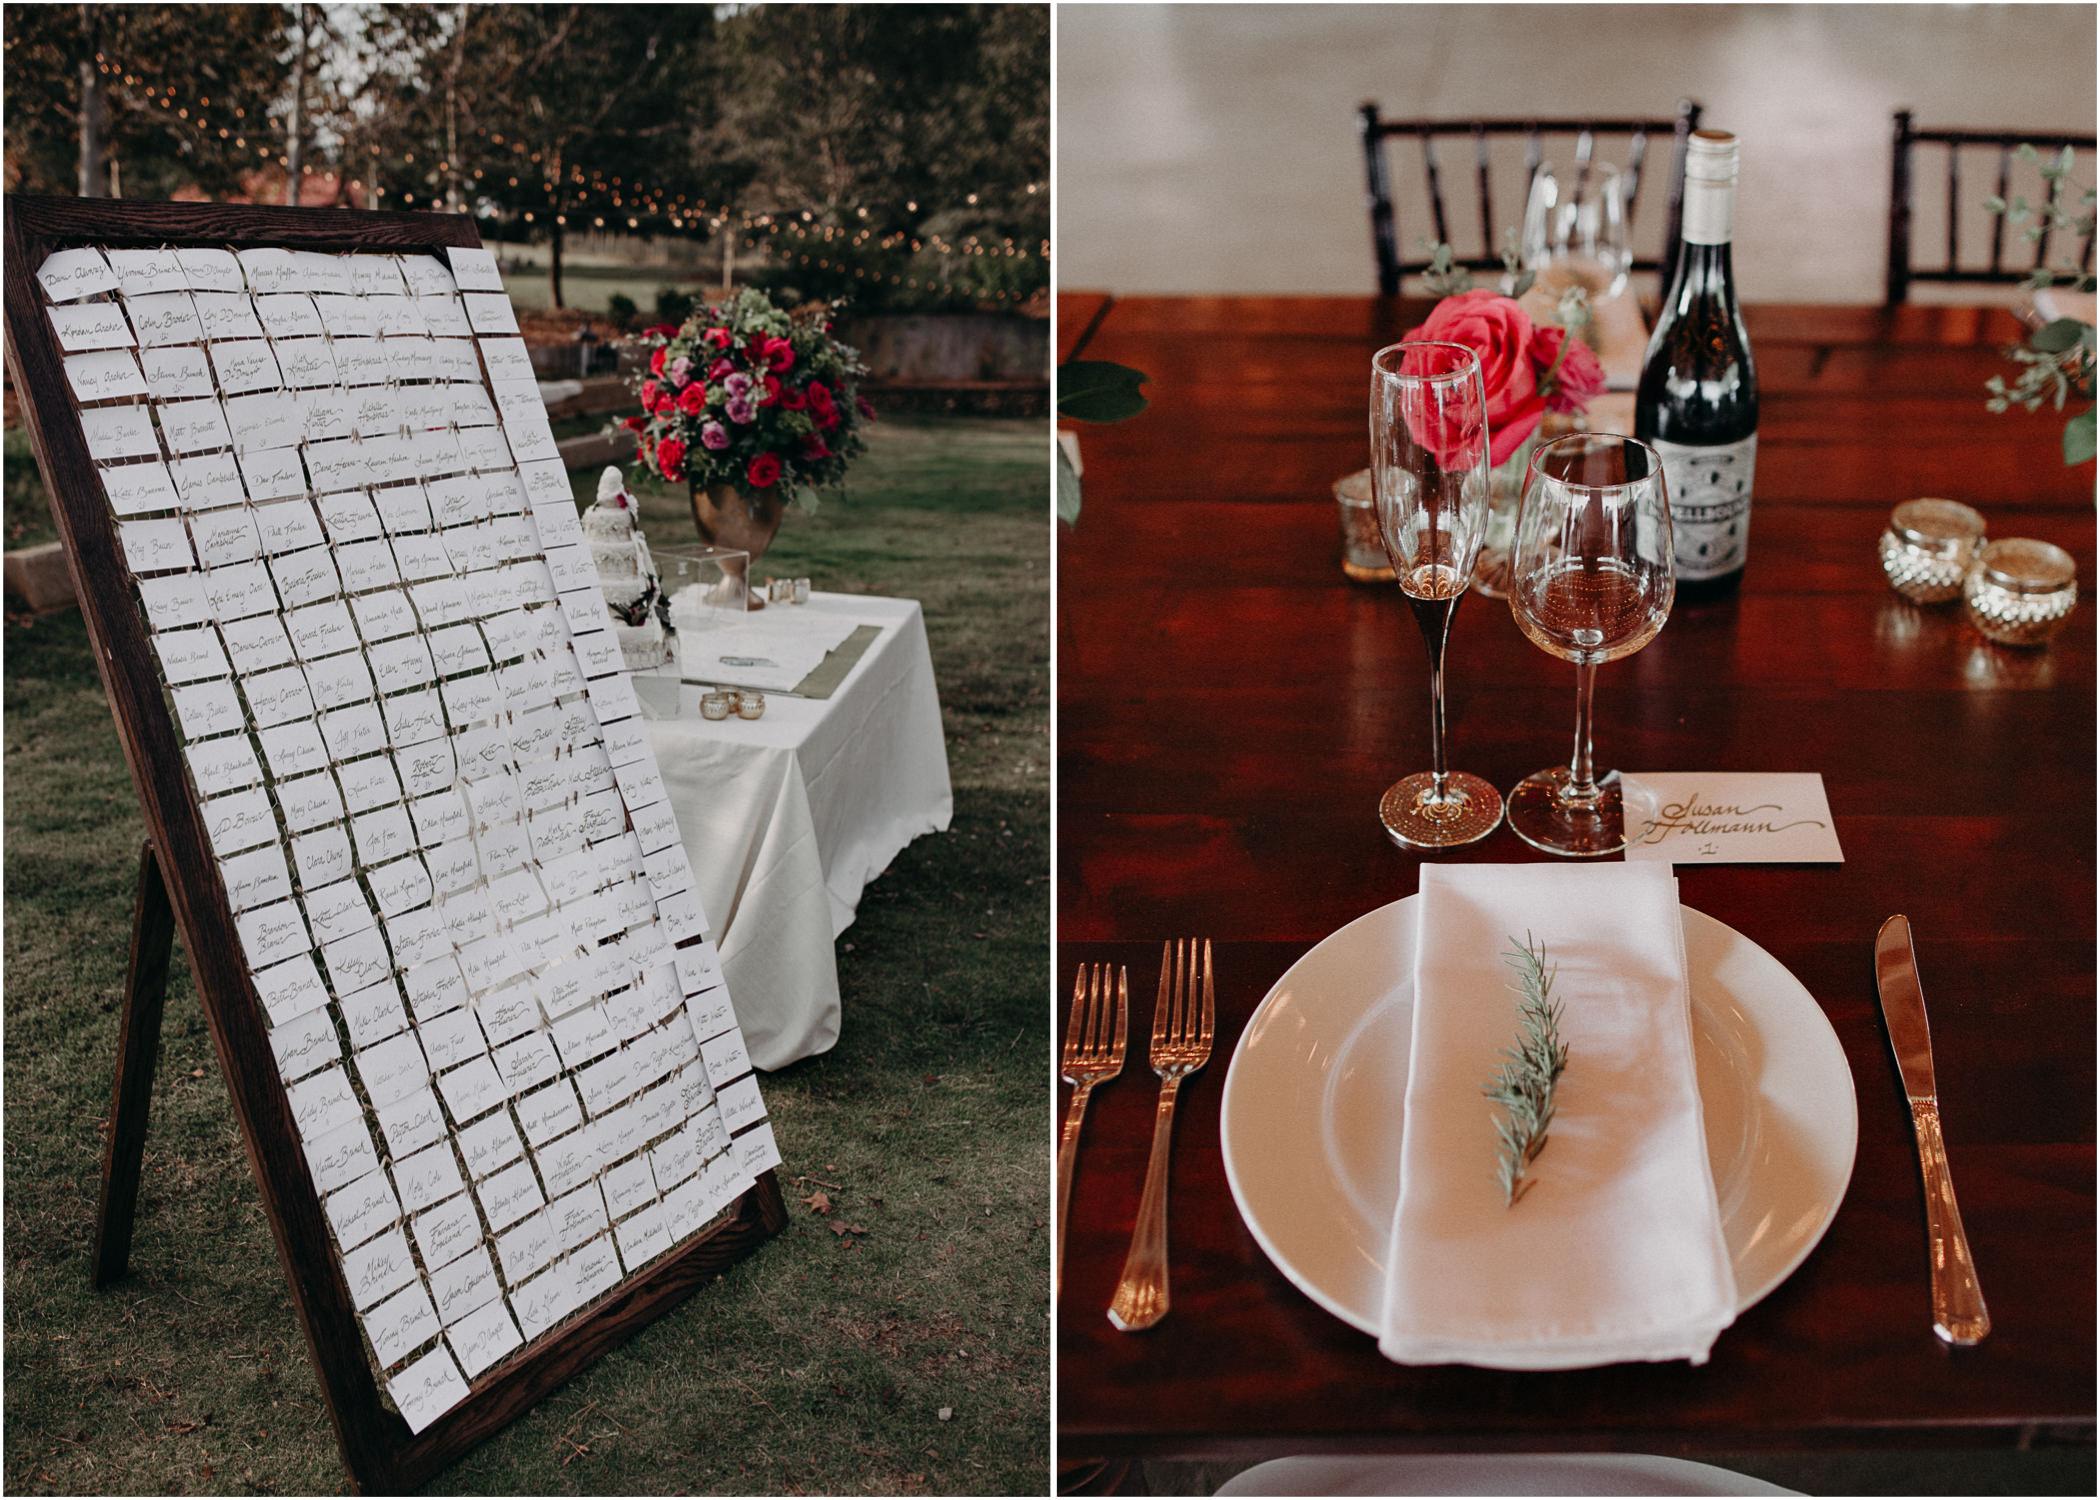 52 - details, cake, flowers, wedding dress, bridesmaids, bouquet - bride getting ready wedding seranbi farms atlanta .jpg